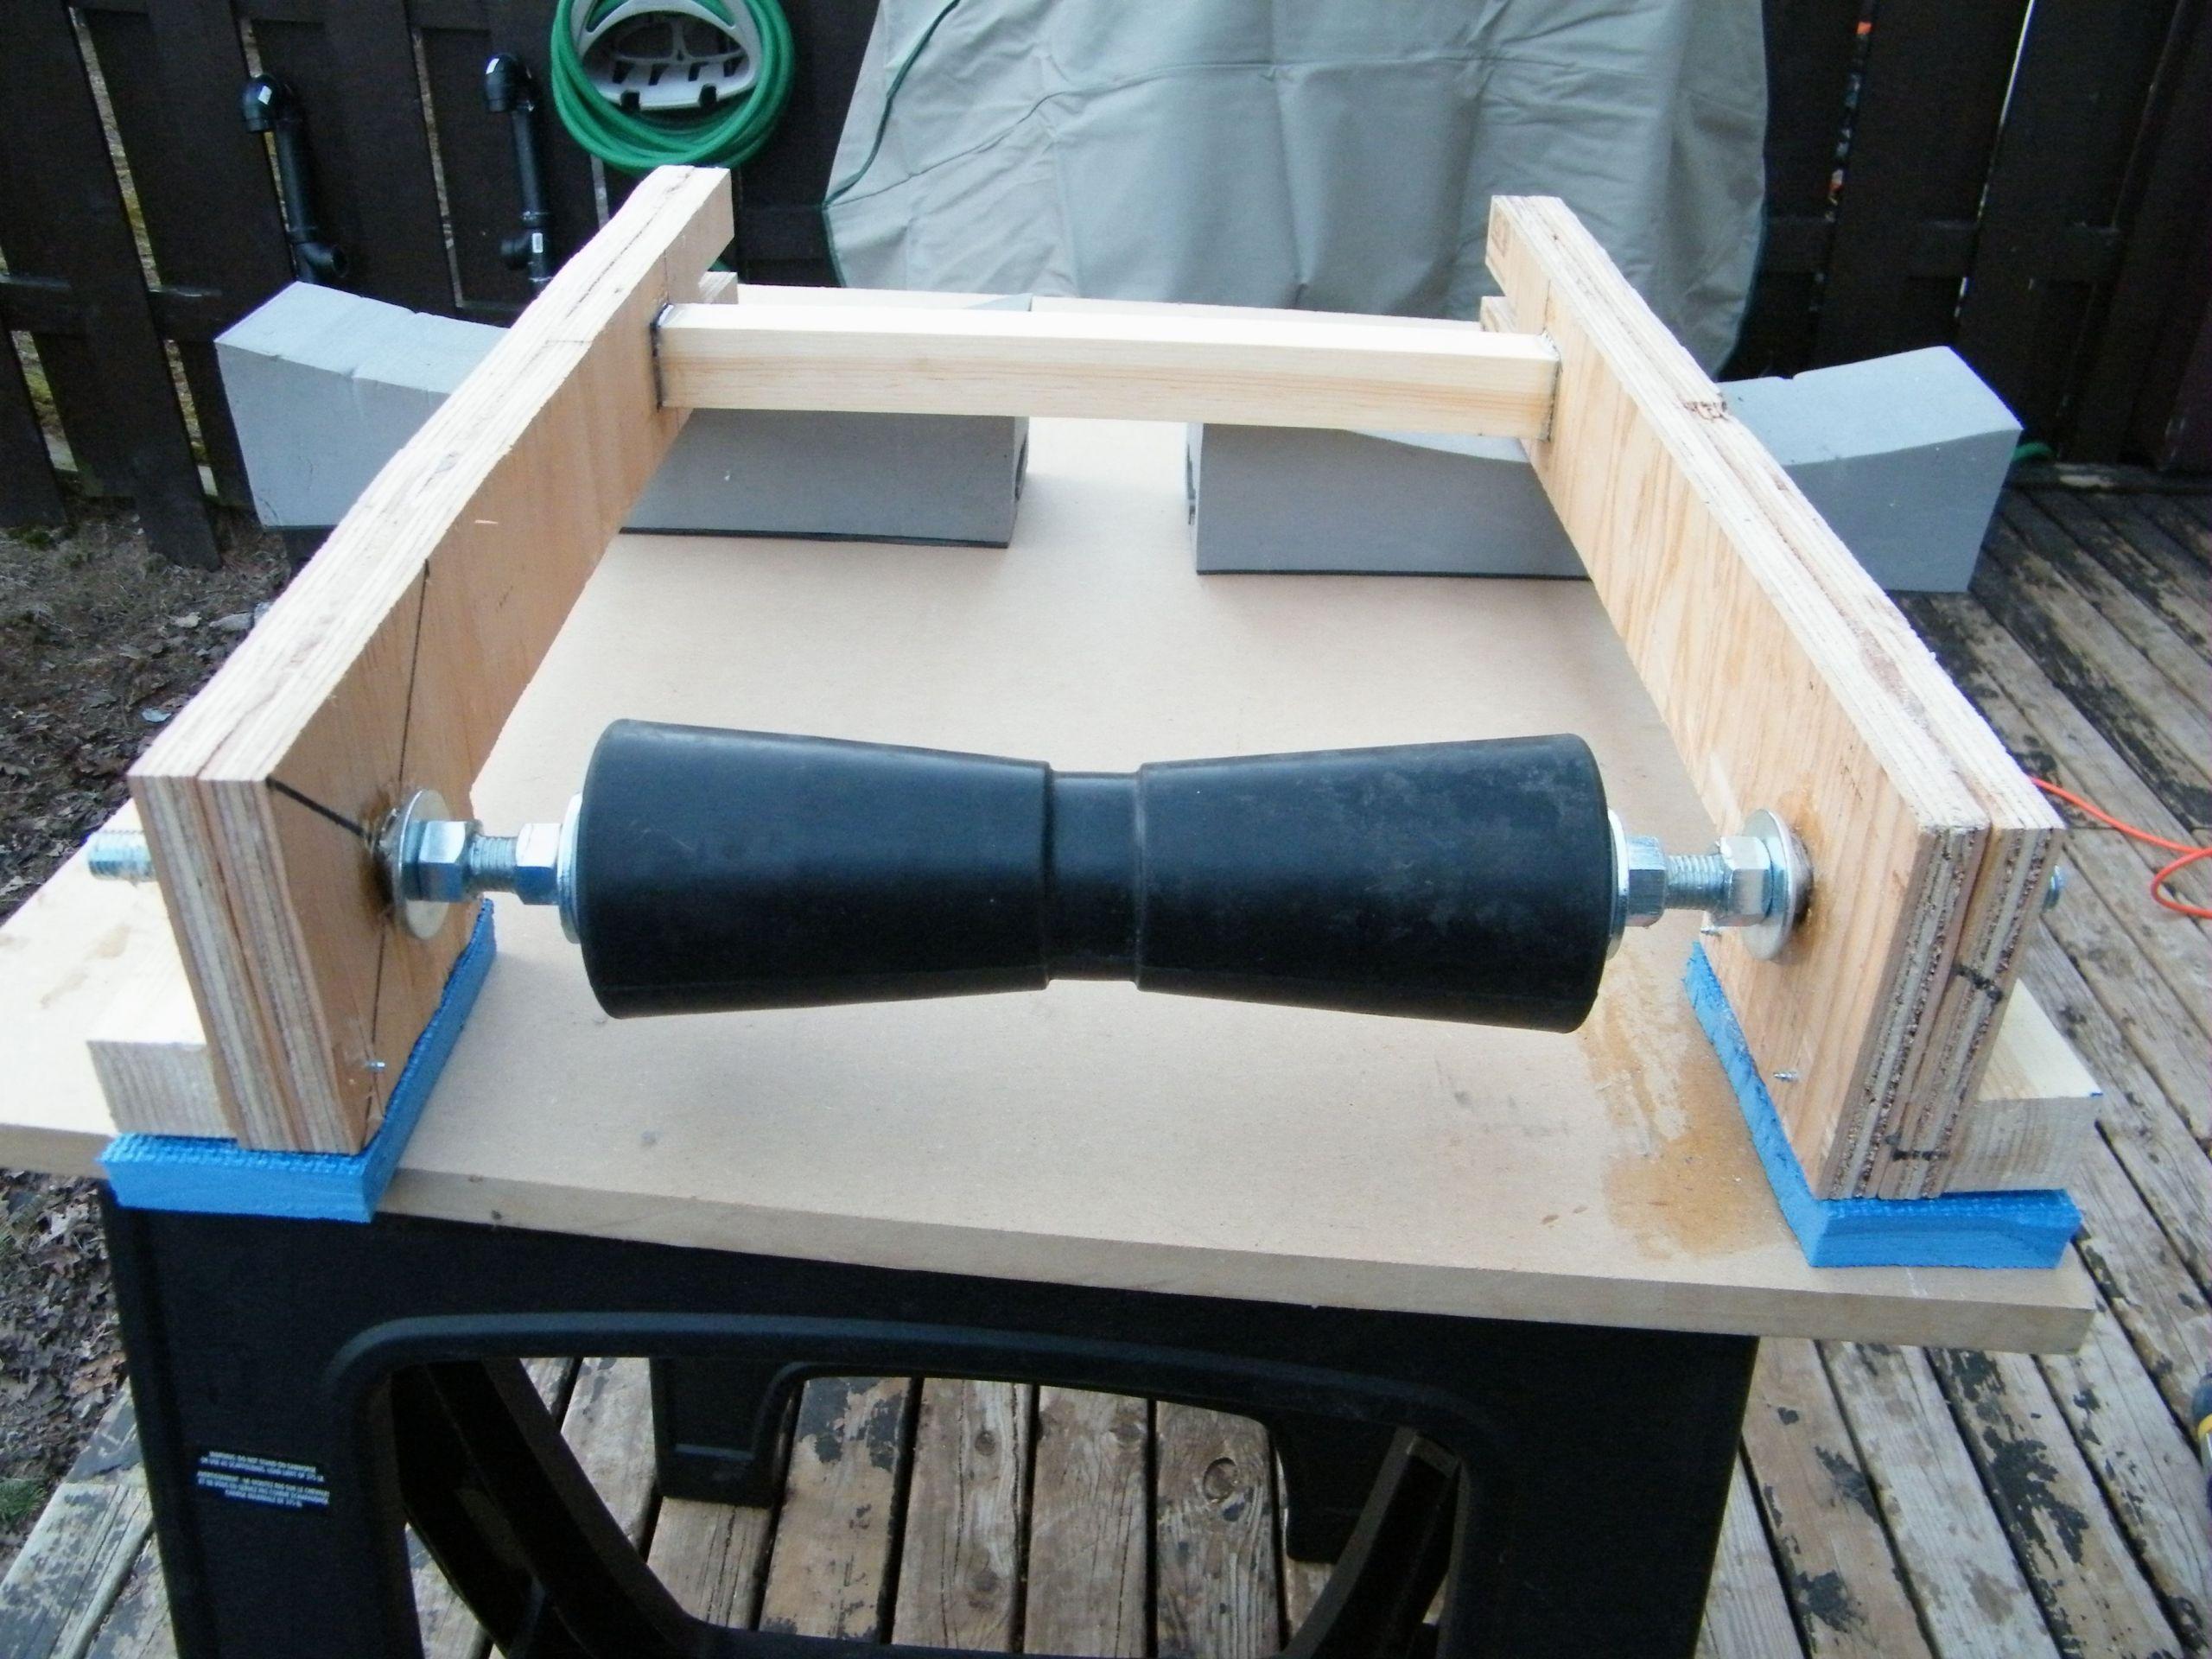 DIY Kayak Rack Pvc  Diy pvc kayak car rack